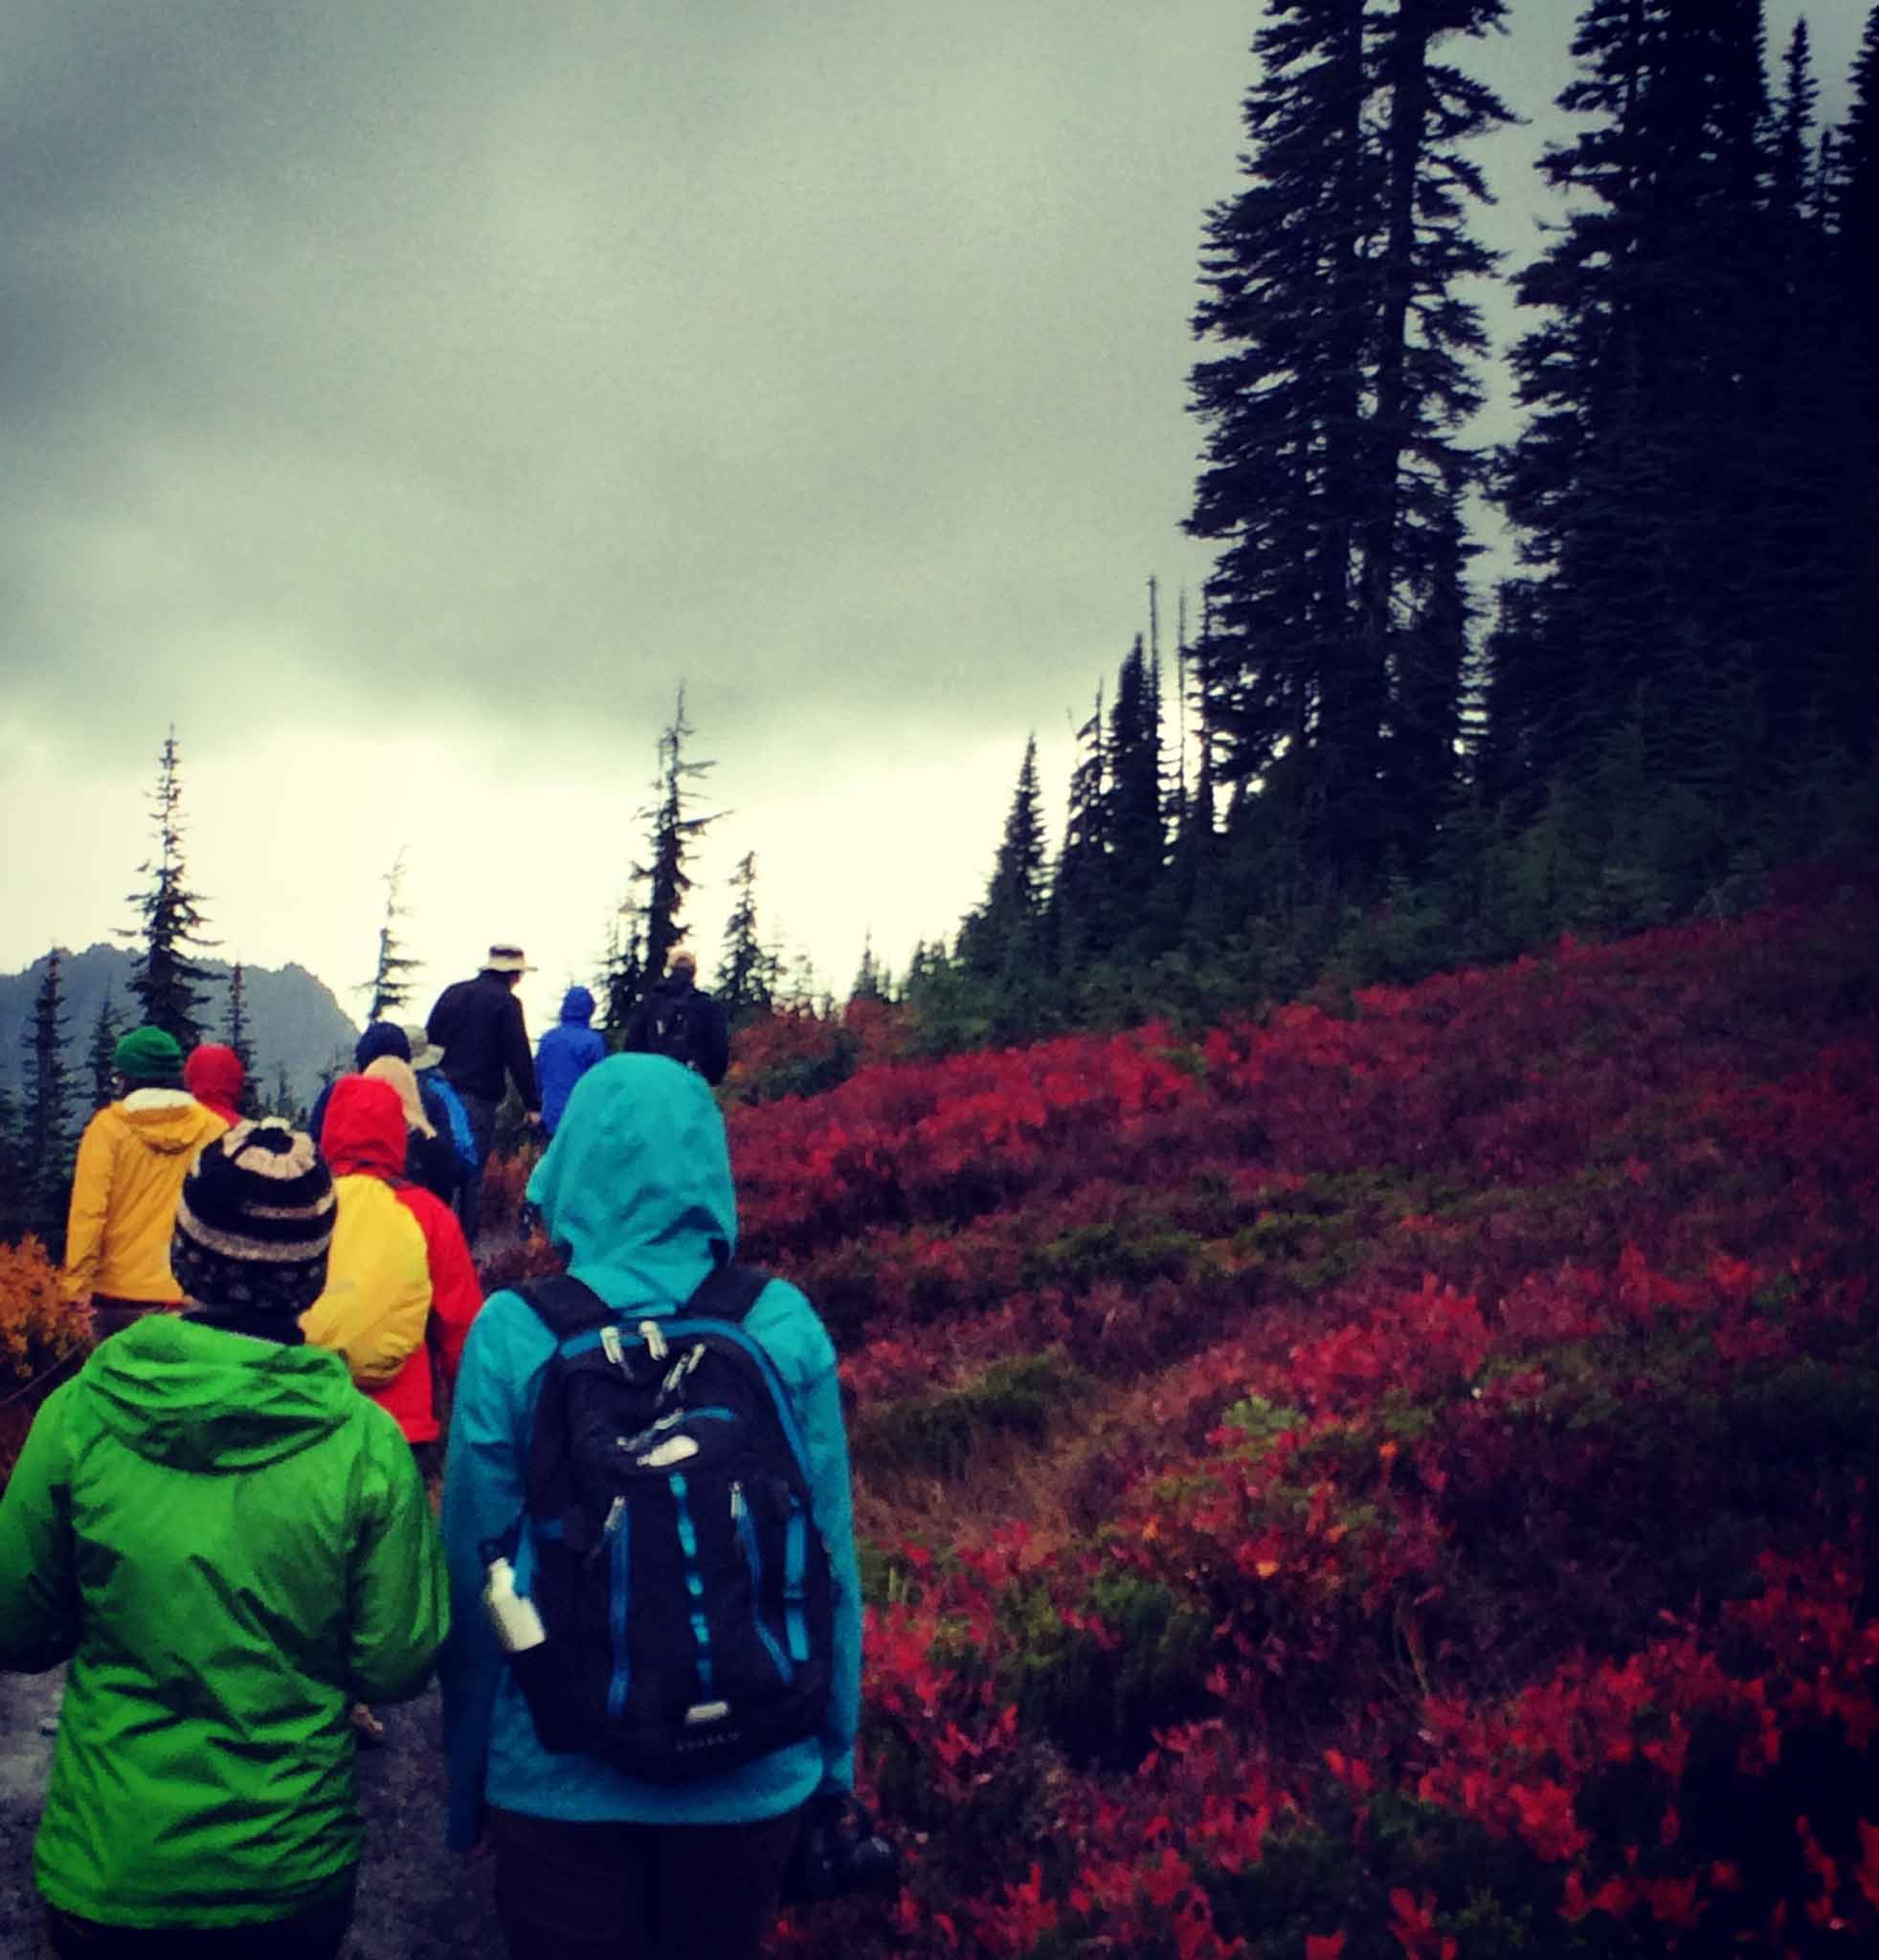 CEHC retreaters hike to Mt. Rainier, Washington. Photograph courtesy of the author.